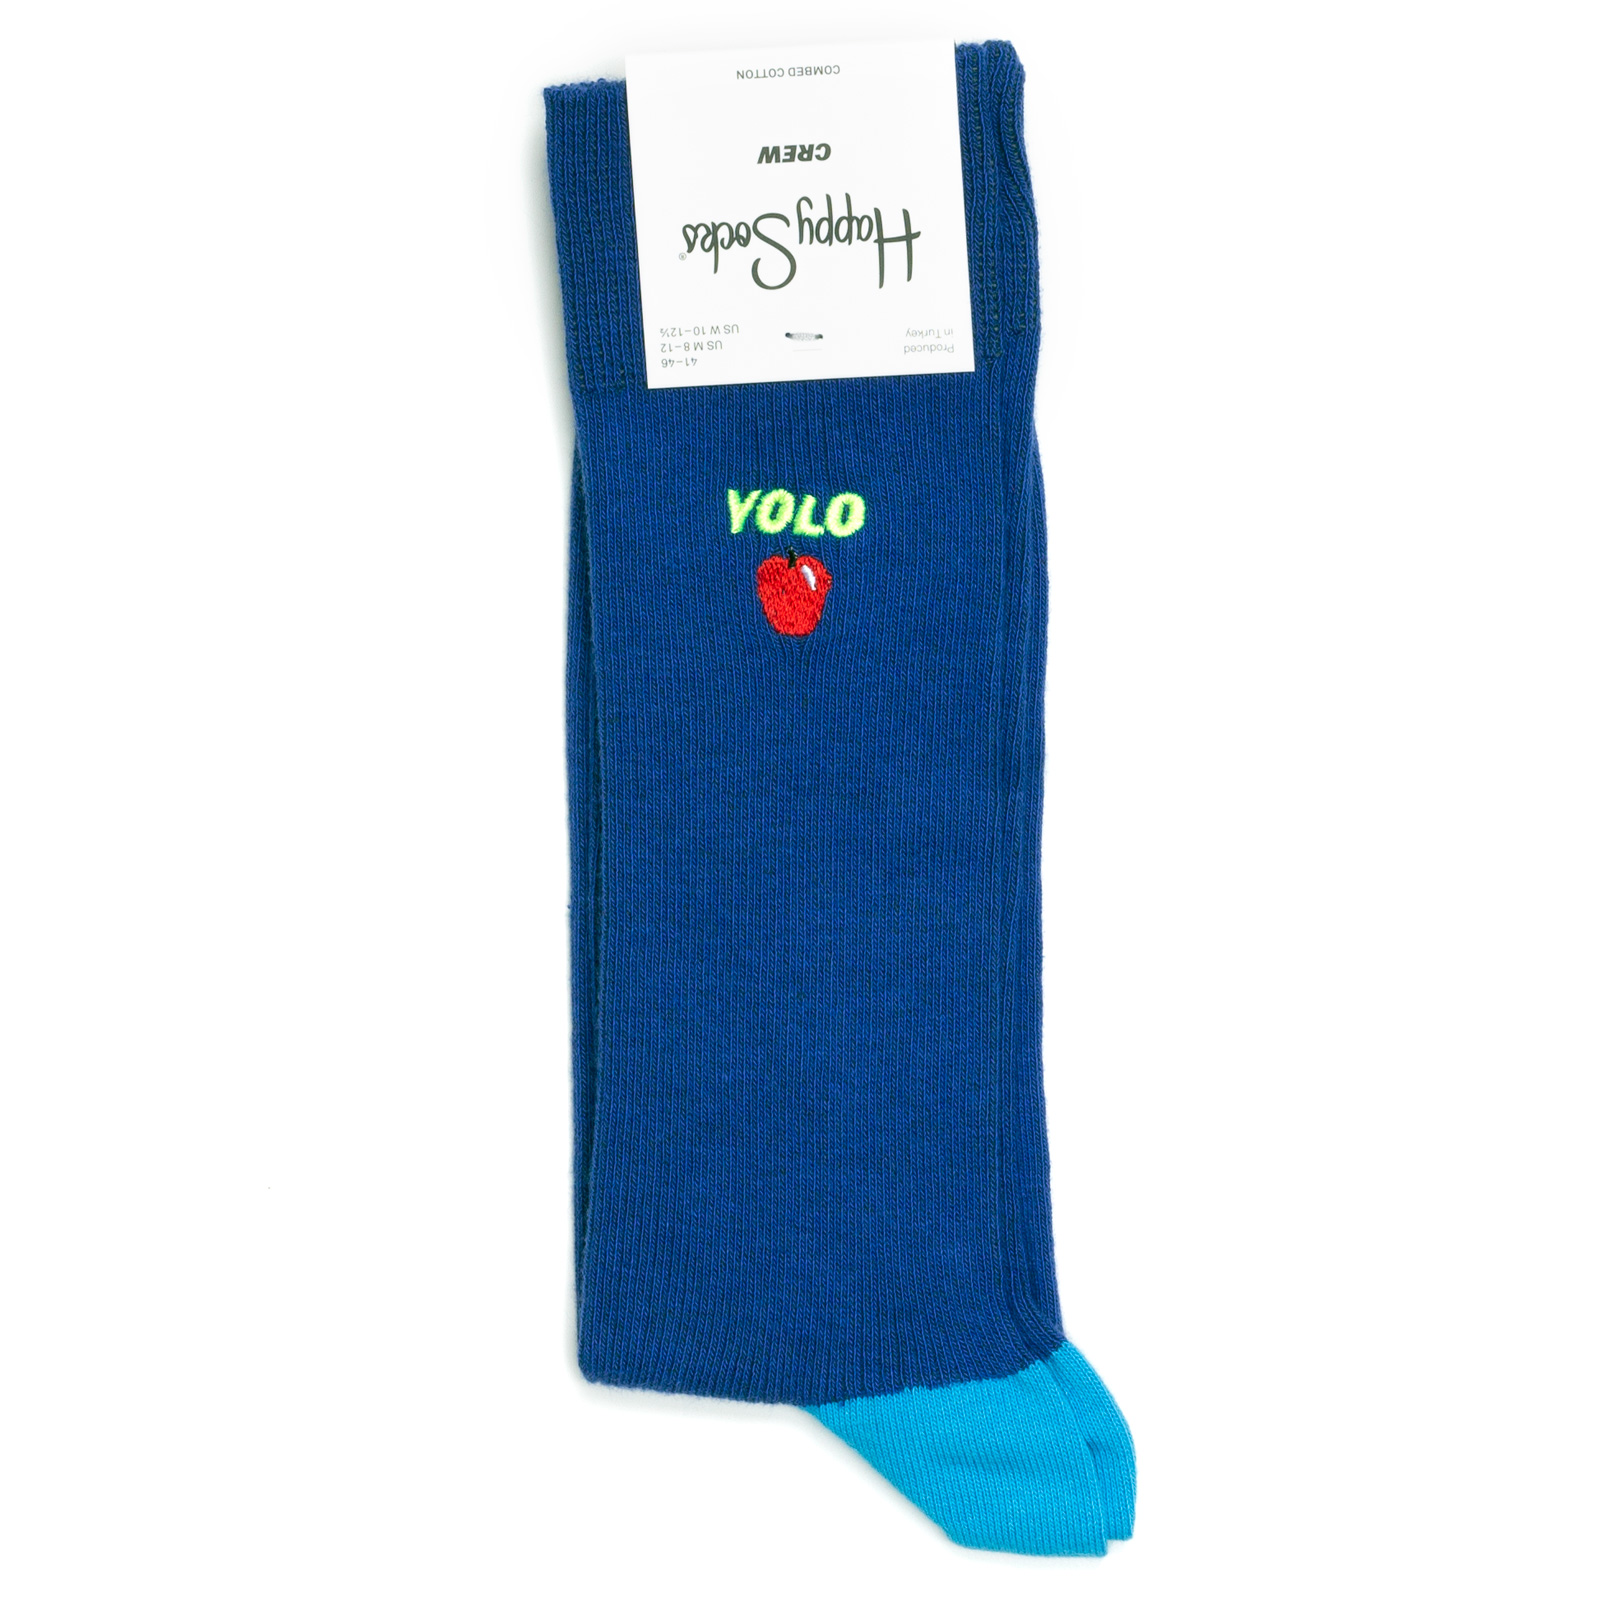 Носки унисекс Happy Socks Yolo разноцветные 36-40